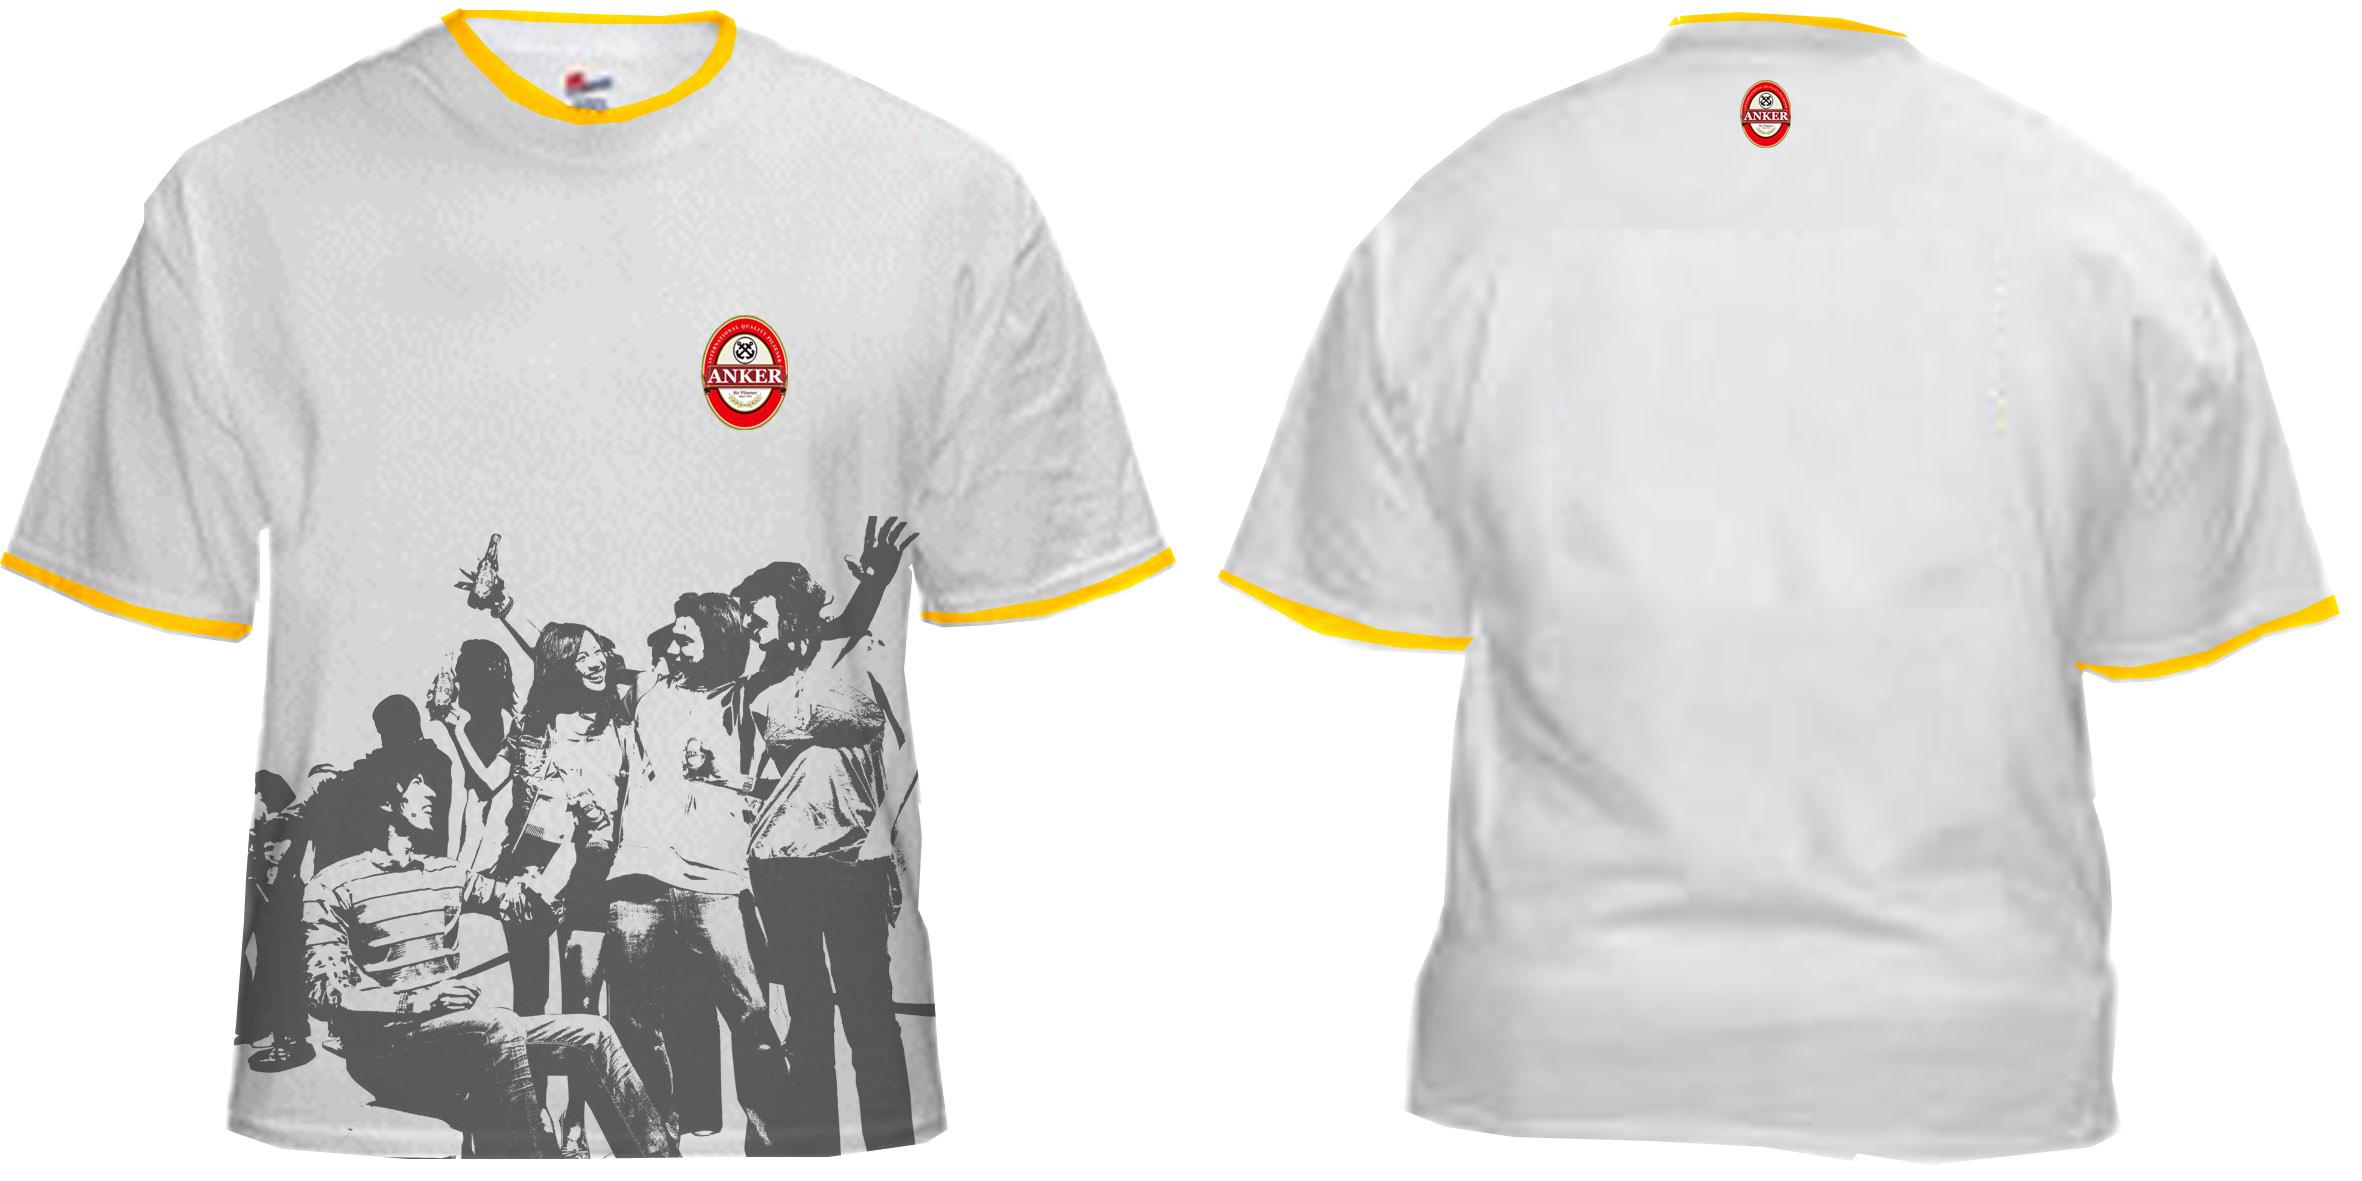 Contoh desain t shirt kelas -  Tshirtab Putih Siluet Antripsd Jpg